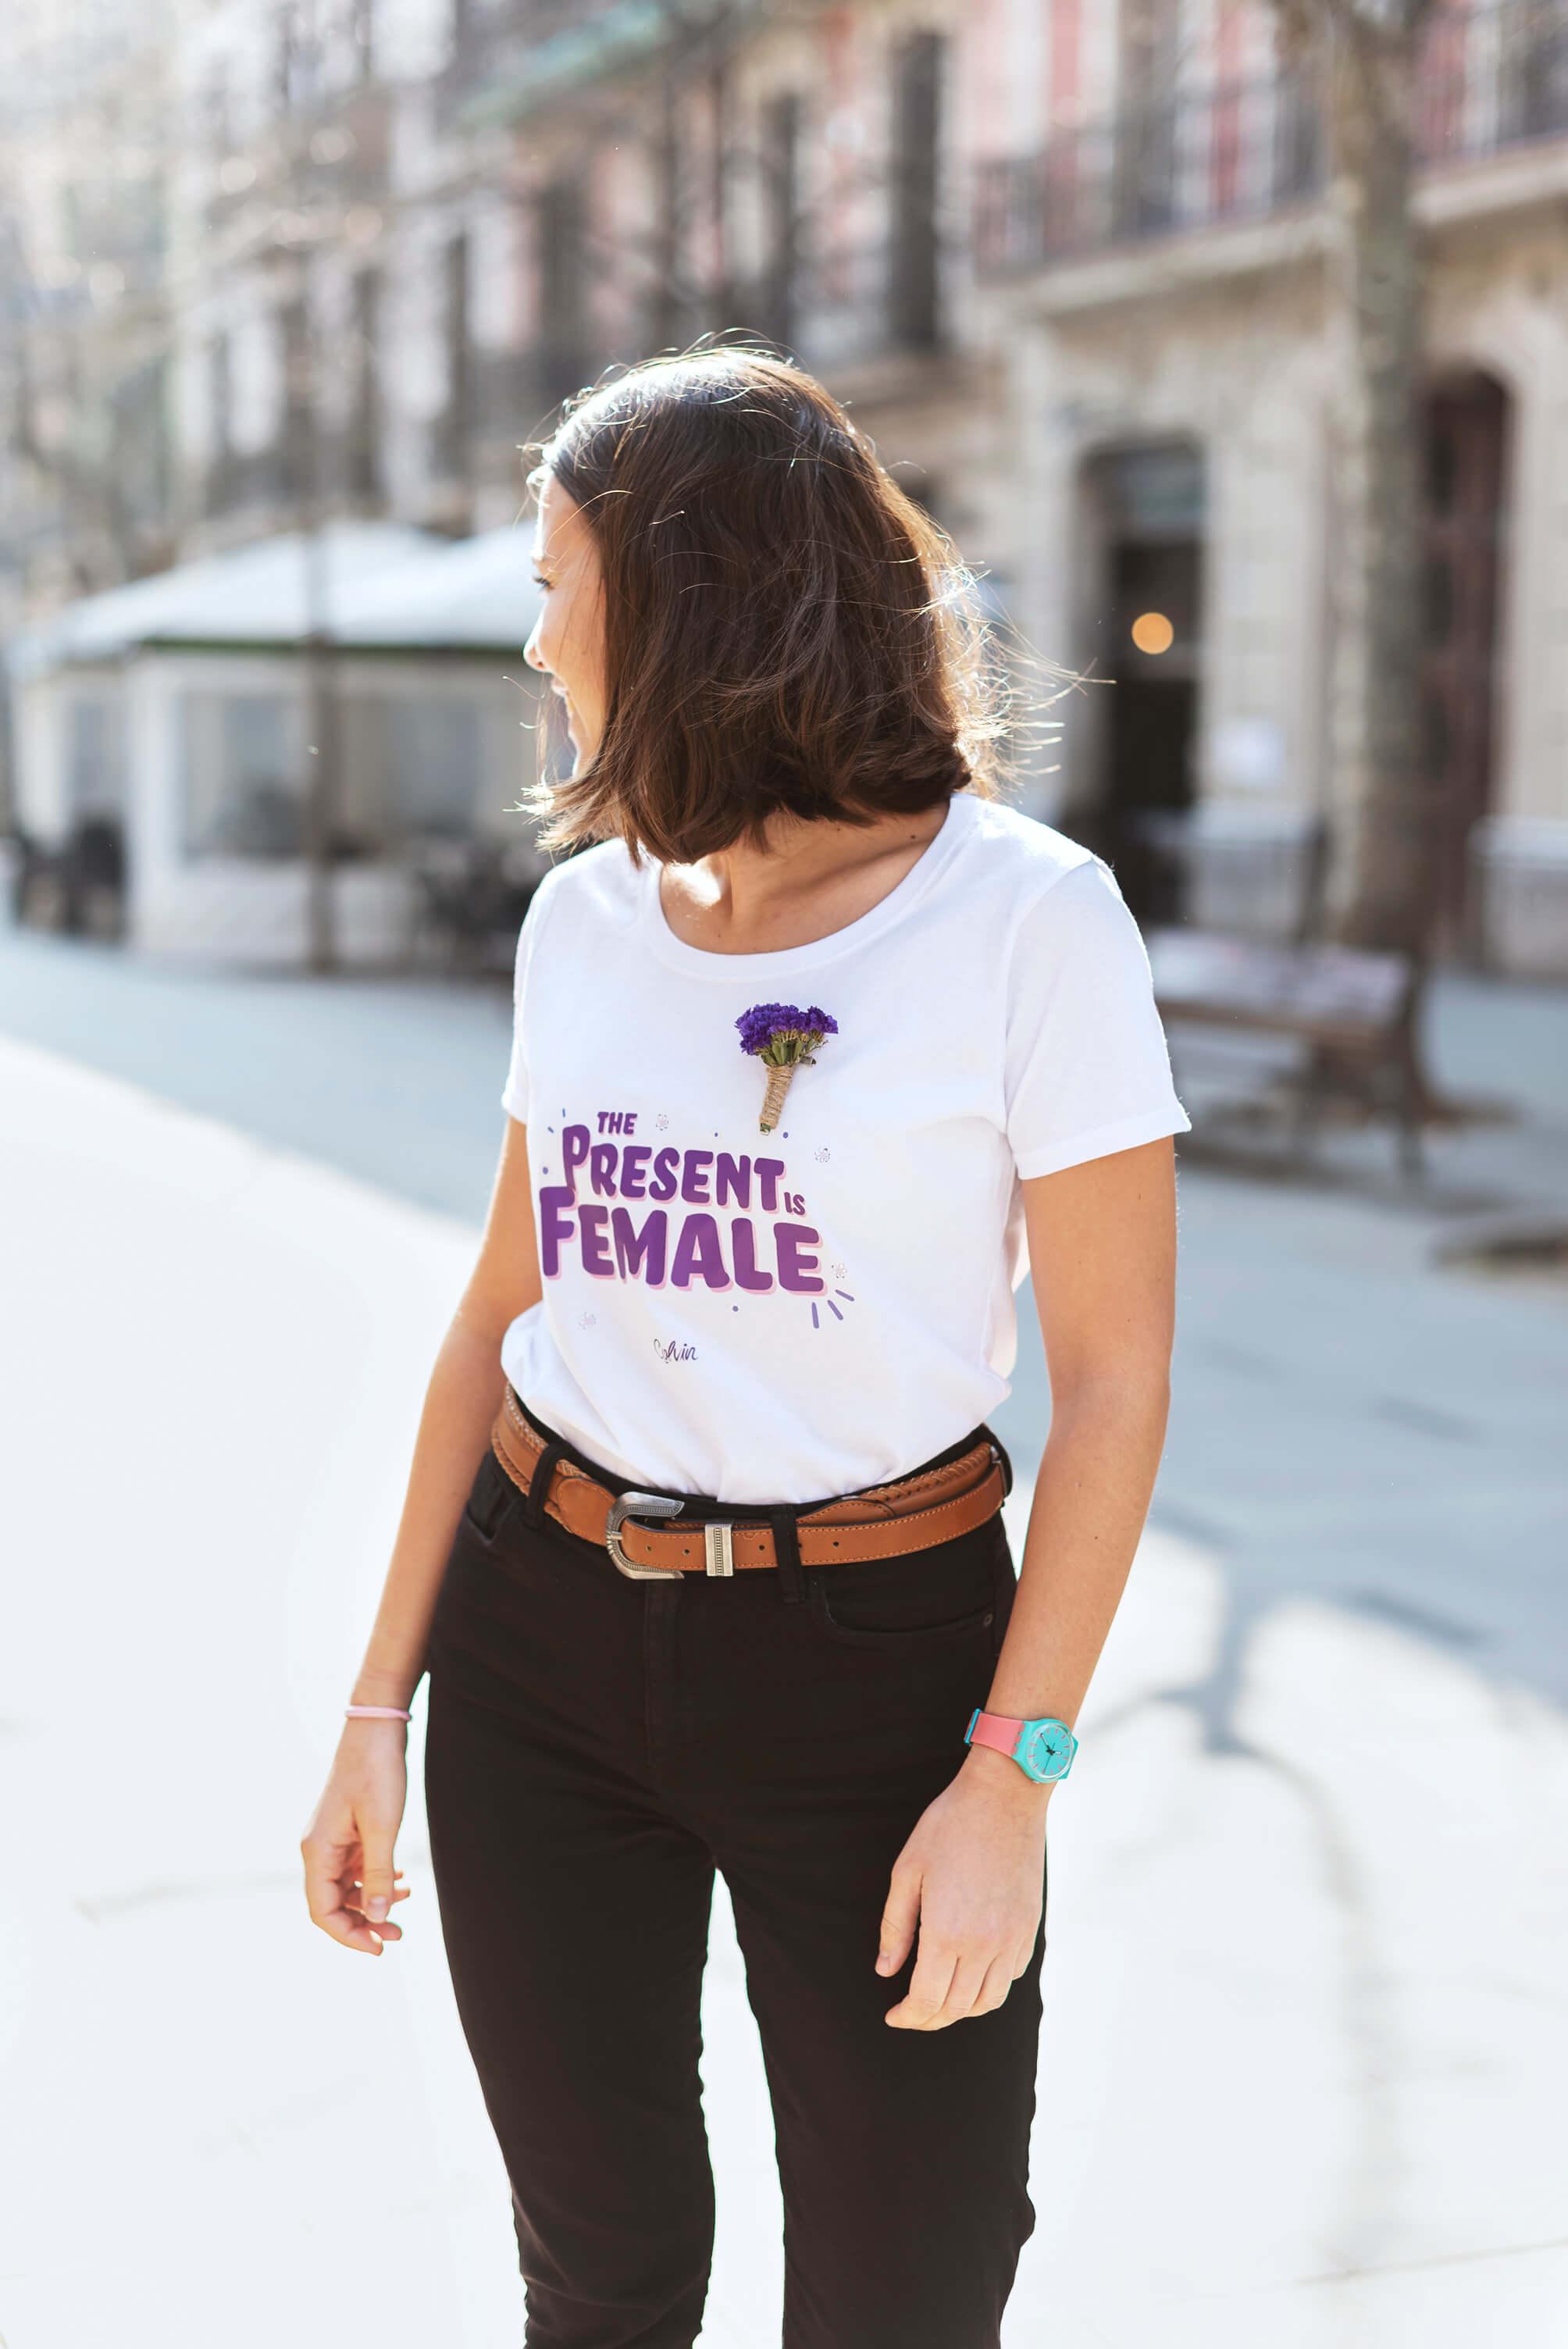 The Present is female camiseta para el dia de la mujer